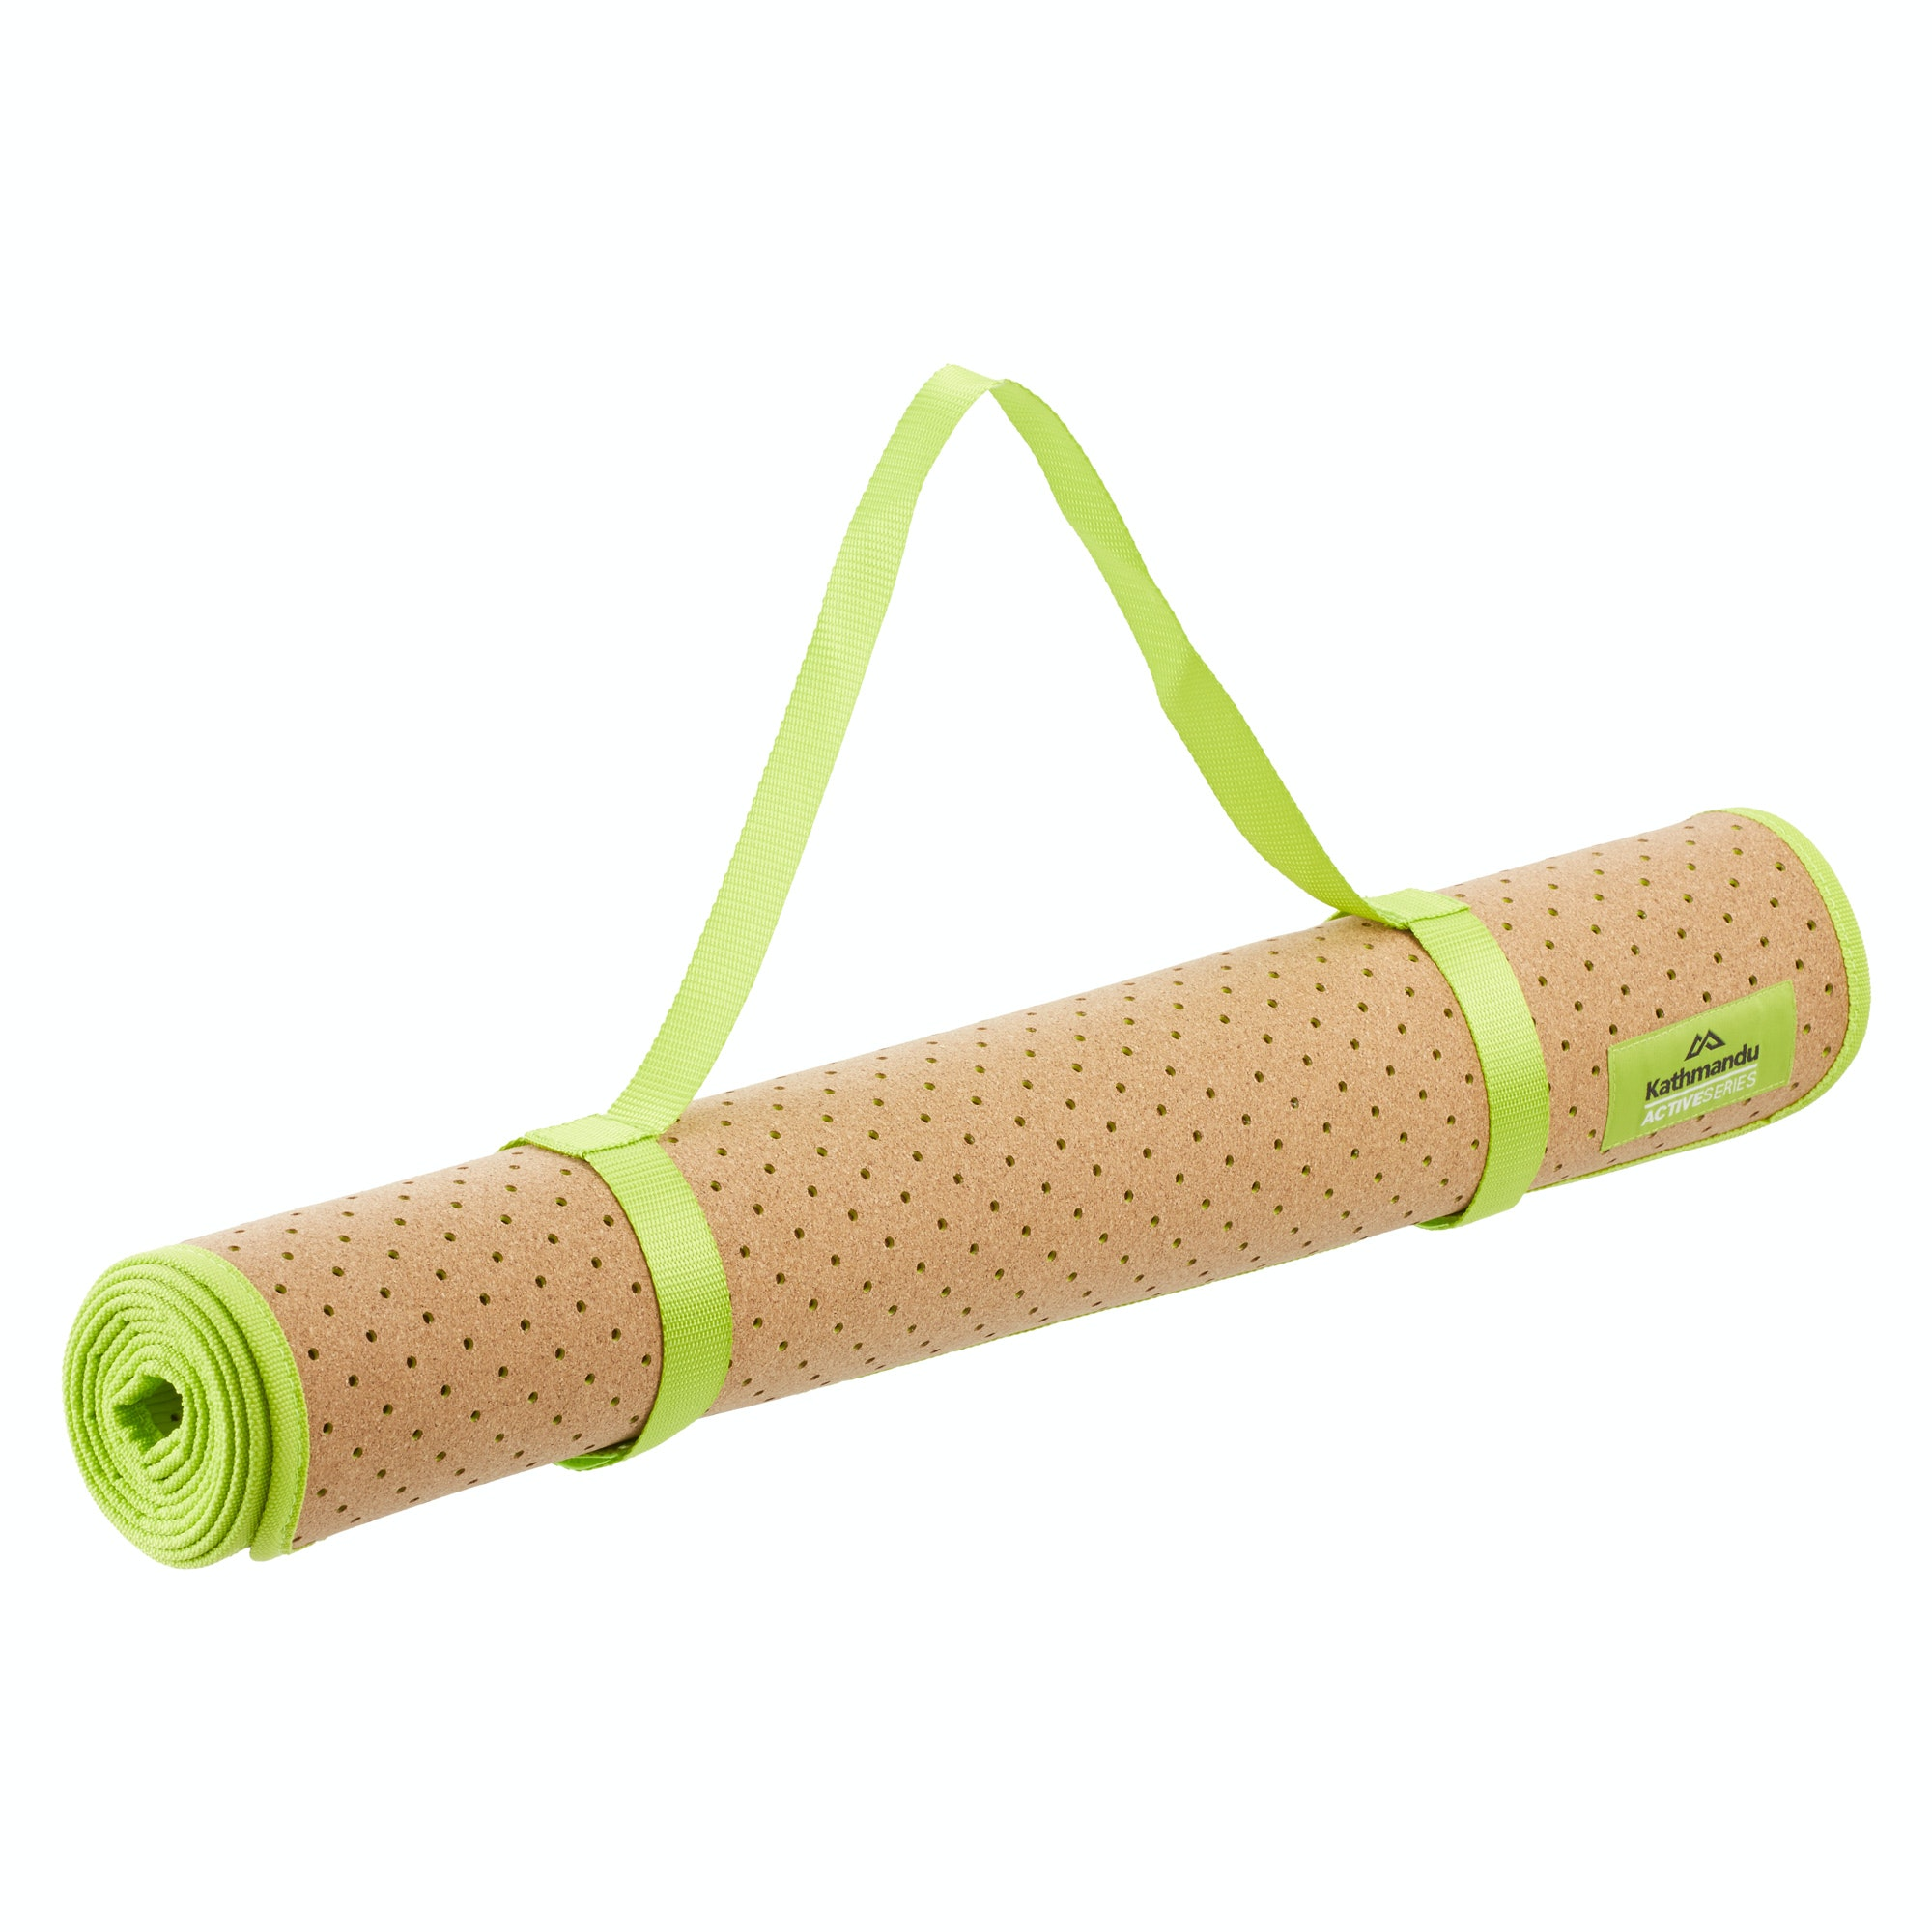 mats solisyoga mat yoga foldcrop stor superlite medres travel eko manduka colors